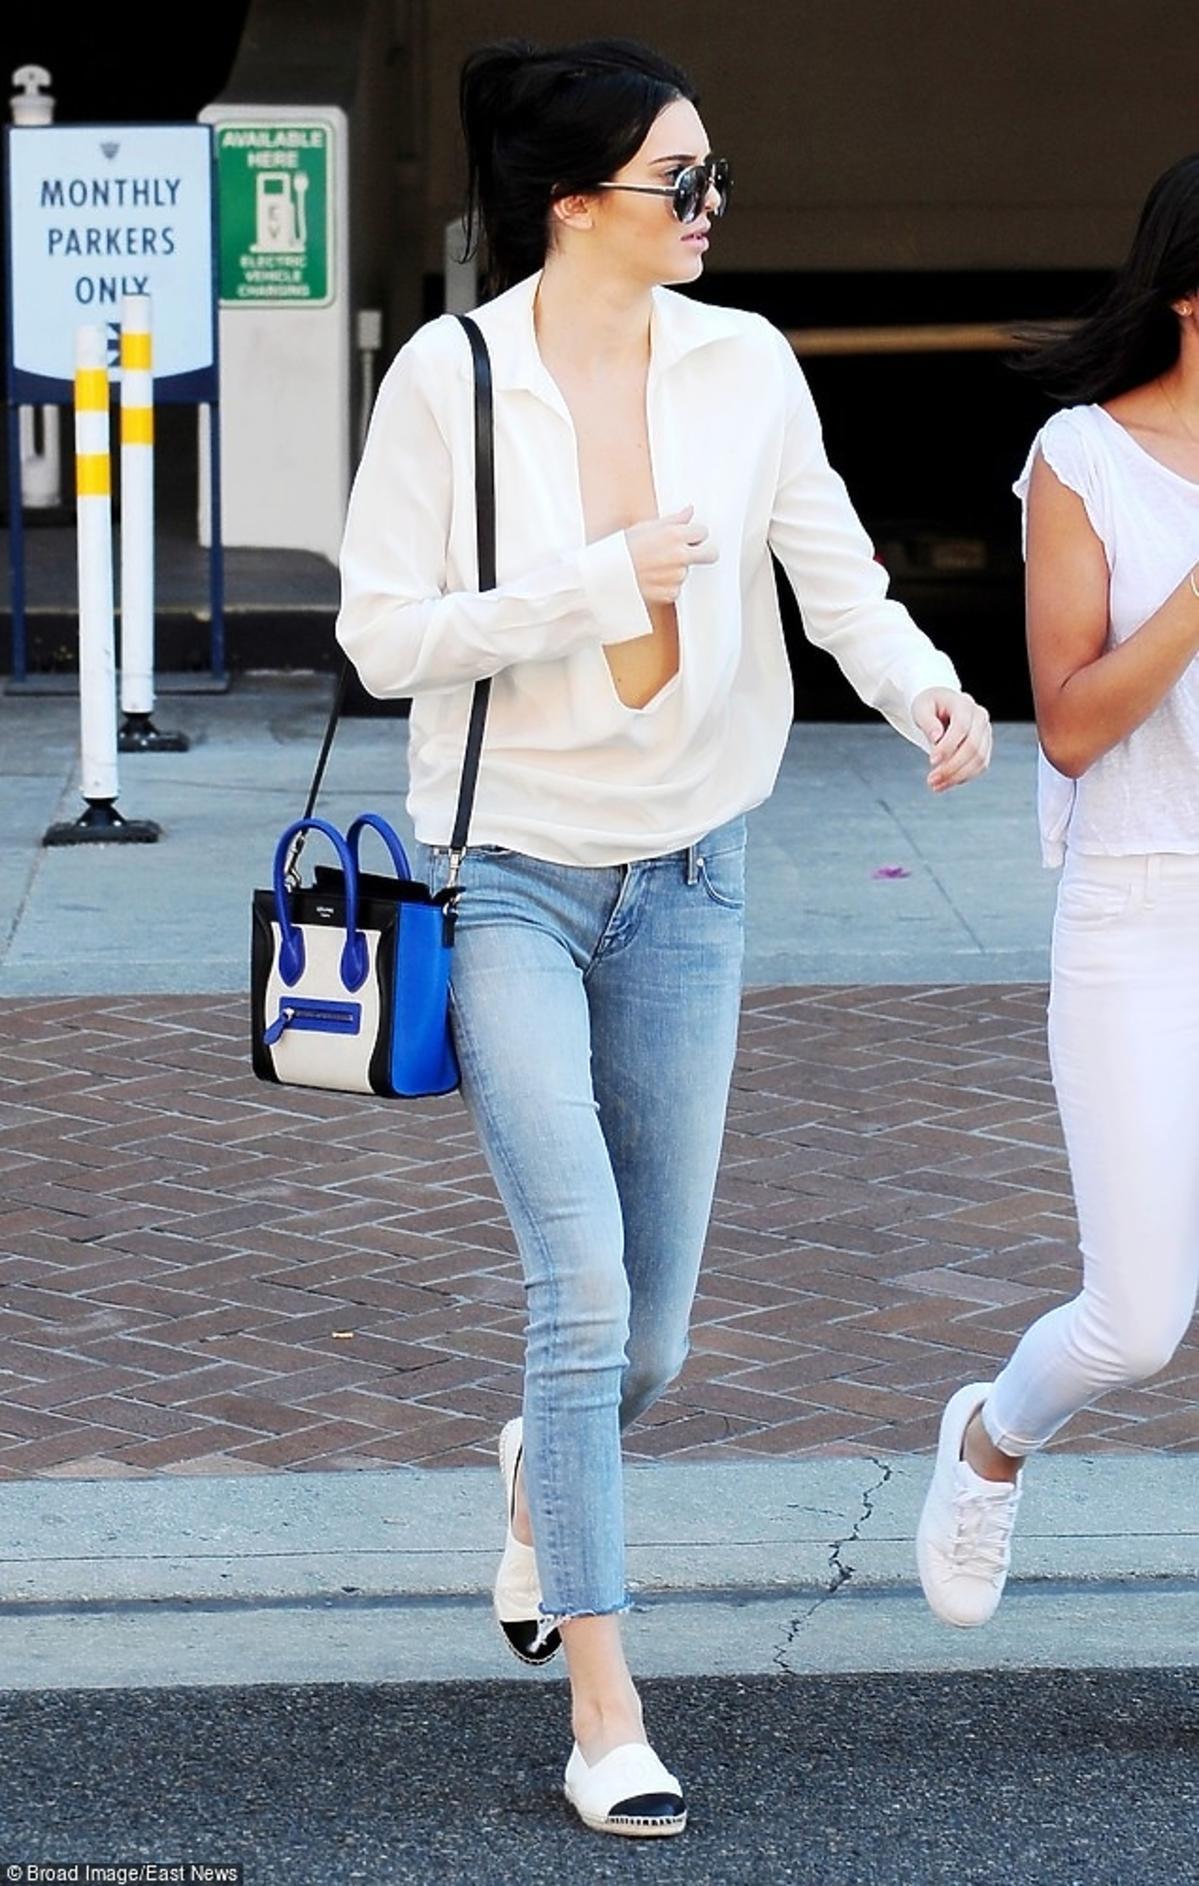 Kendall Jenner bez stanika